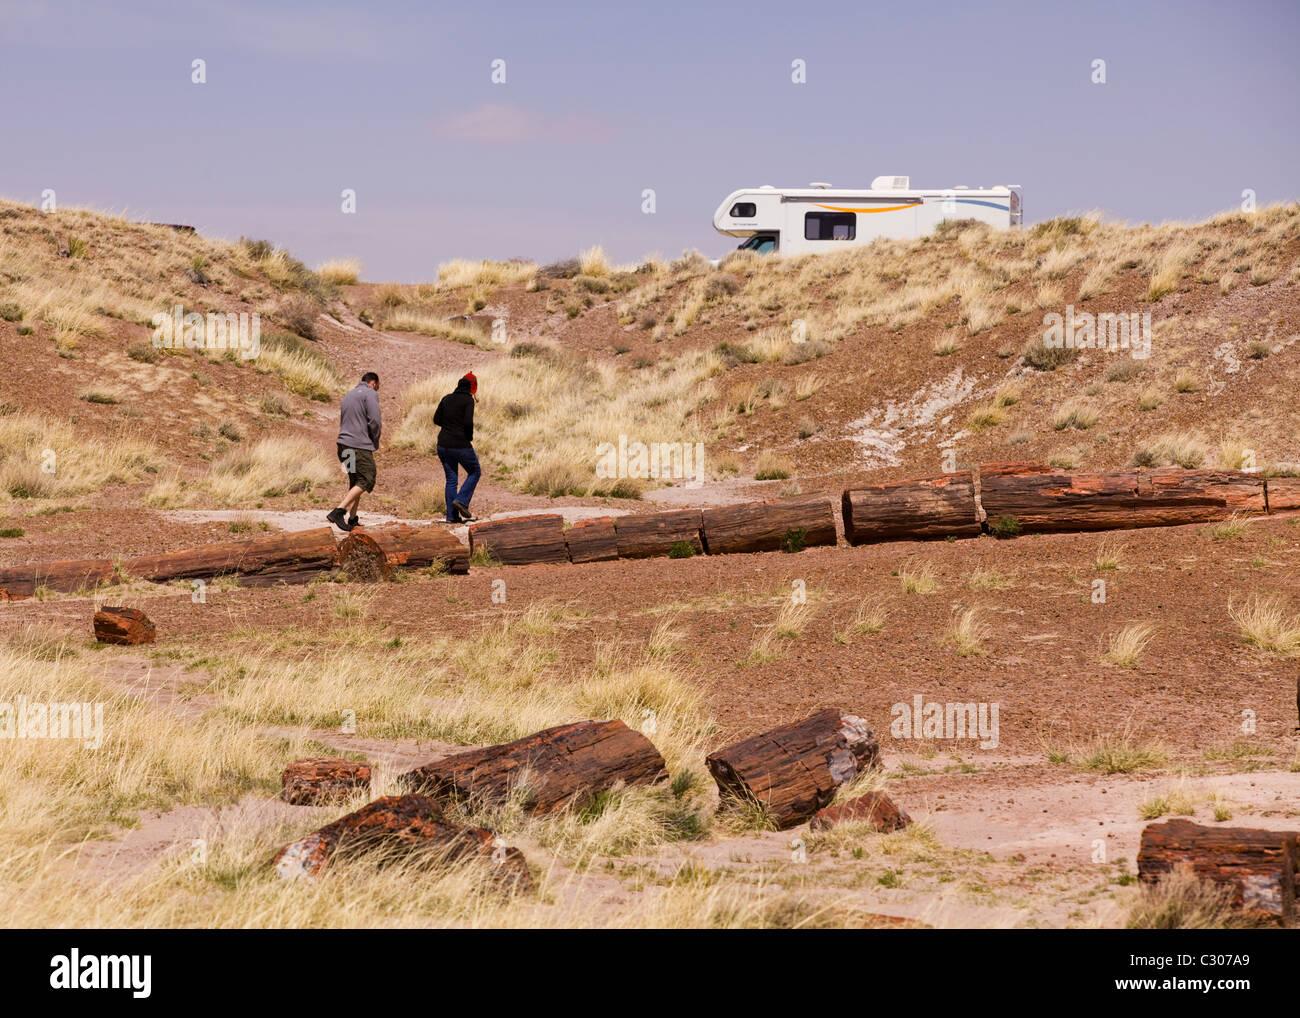 Petrified wood in desert landscape - Arizona USA - Stock Image